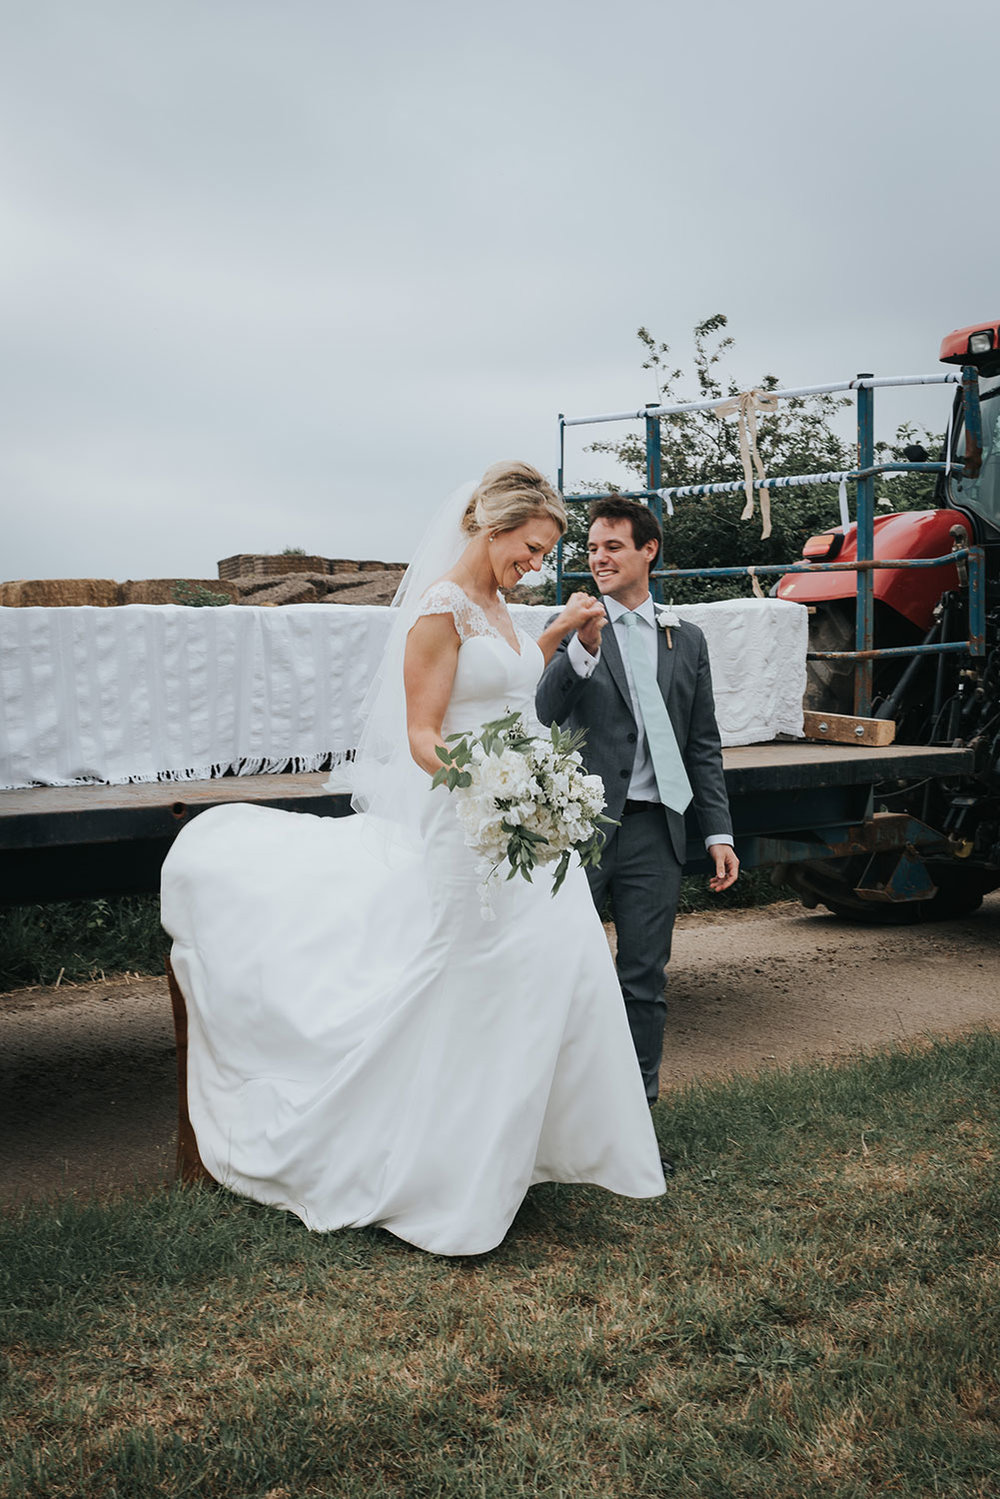 Wedding Photographer in Frinton On Sea - Essex Wedding Photographer